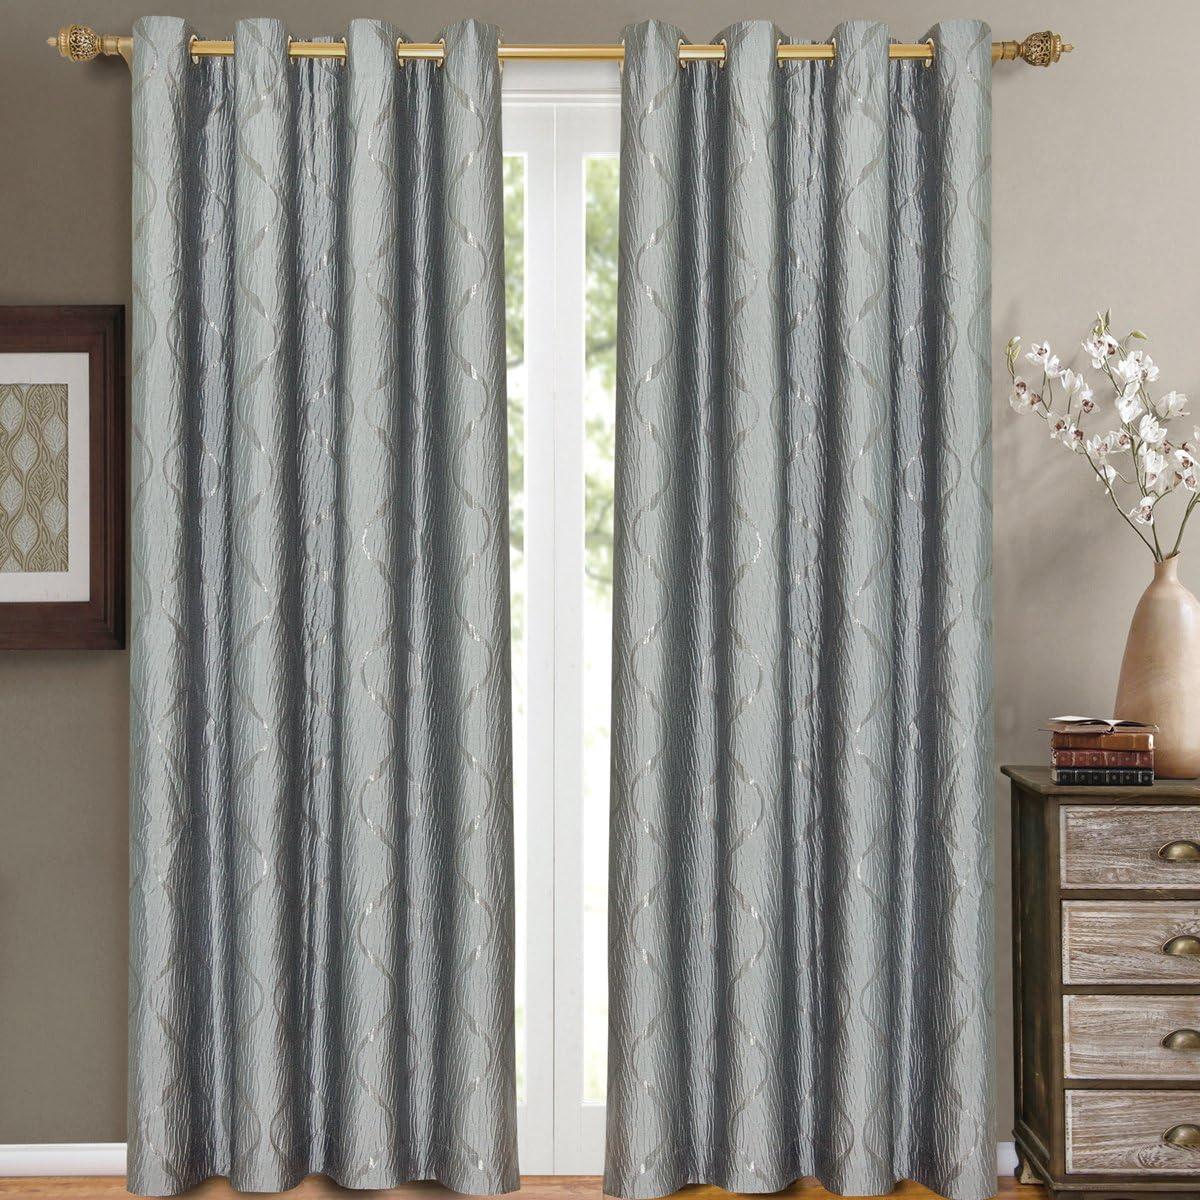 eLuxurySupply Laguna Jacquard Grommet Top Curtain Panel Window Treatment – Set of Two 2 – Multiple Sizes Colors Available